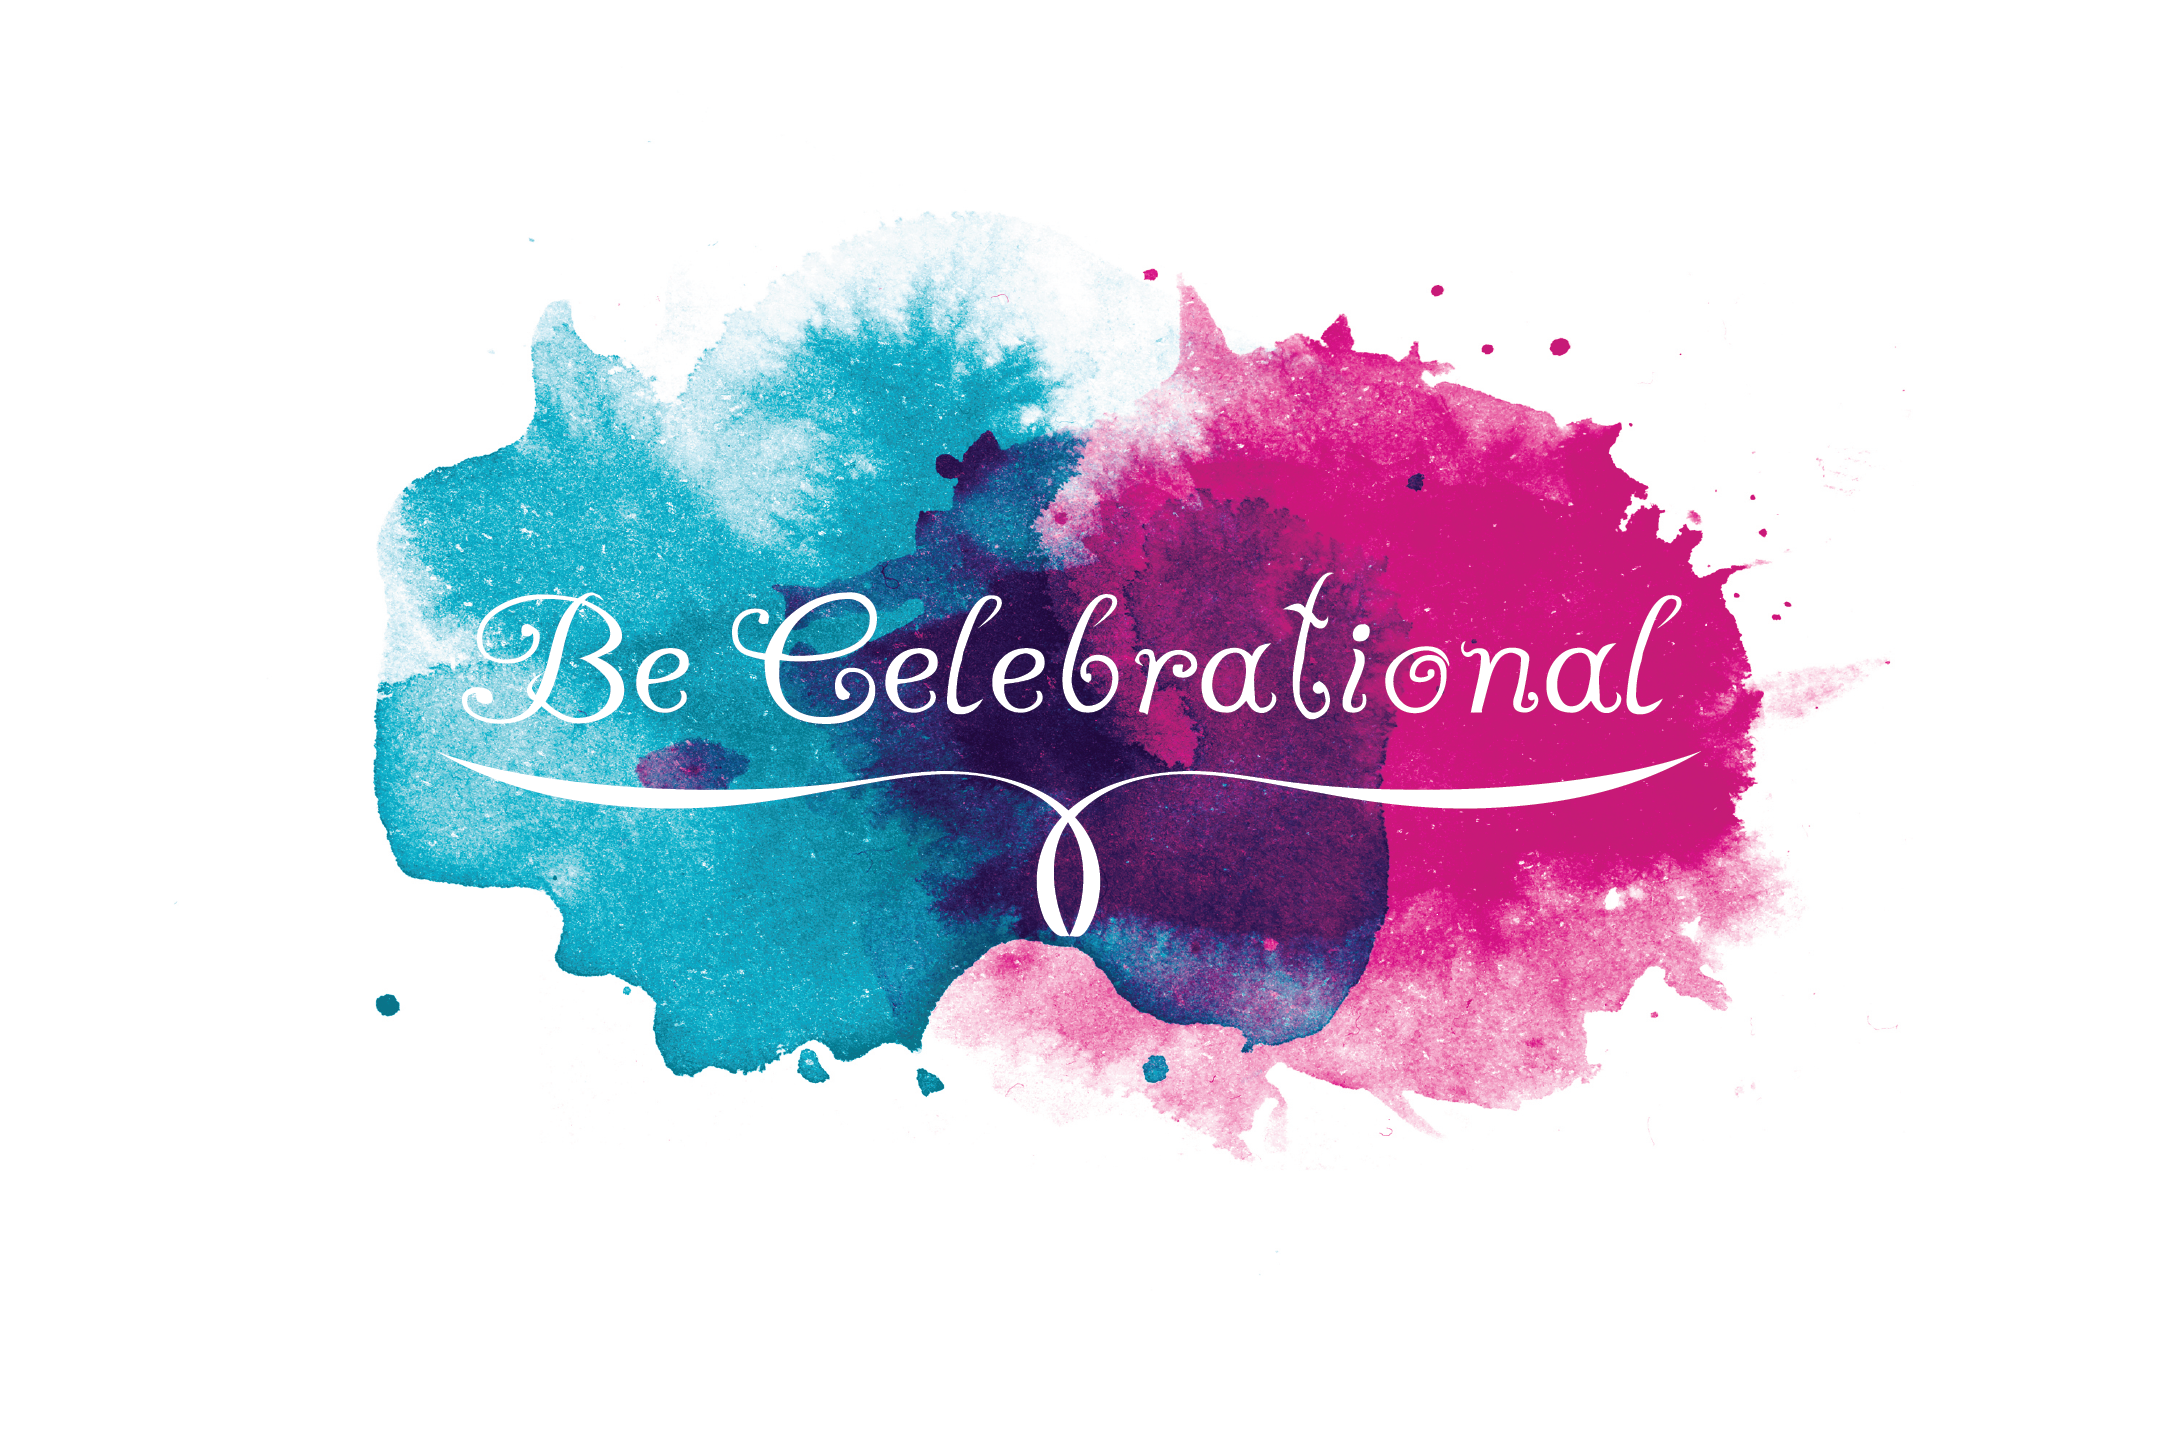 Be Celebrational